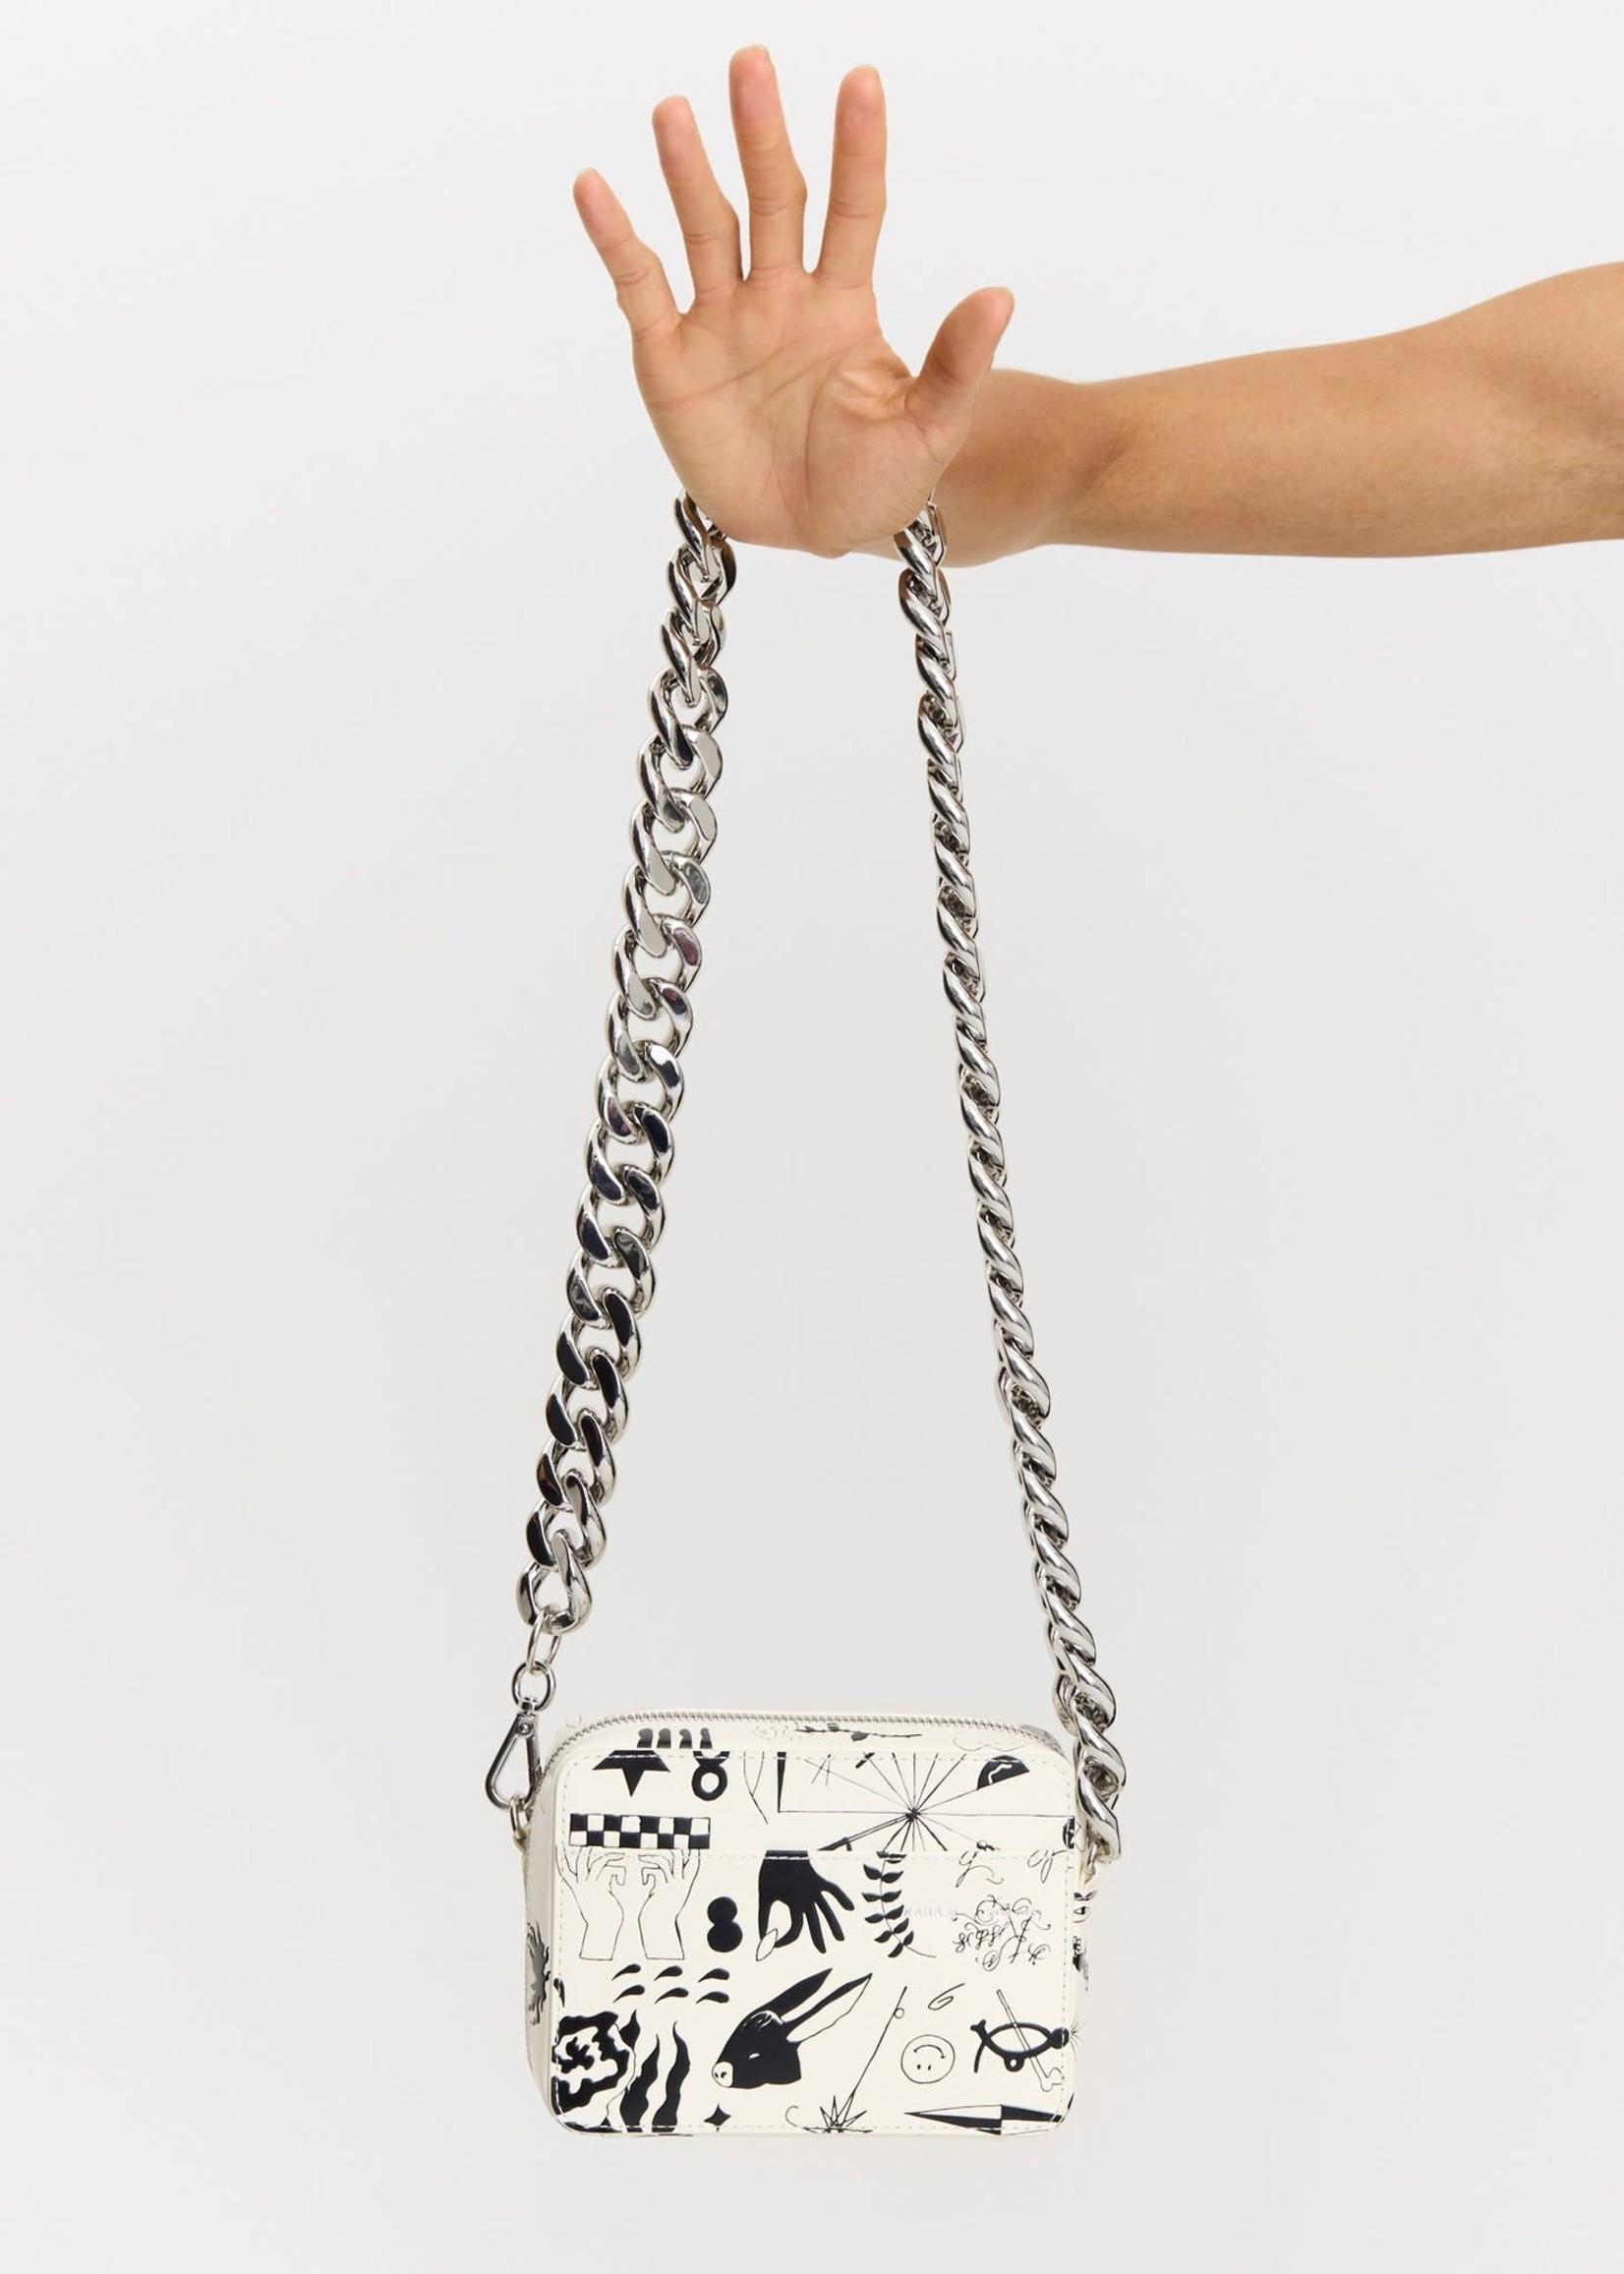 KARA Camera Bag in black and white Print